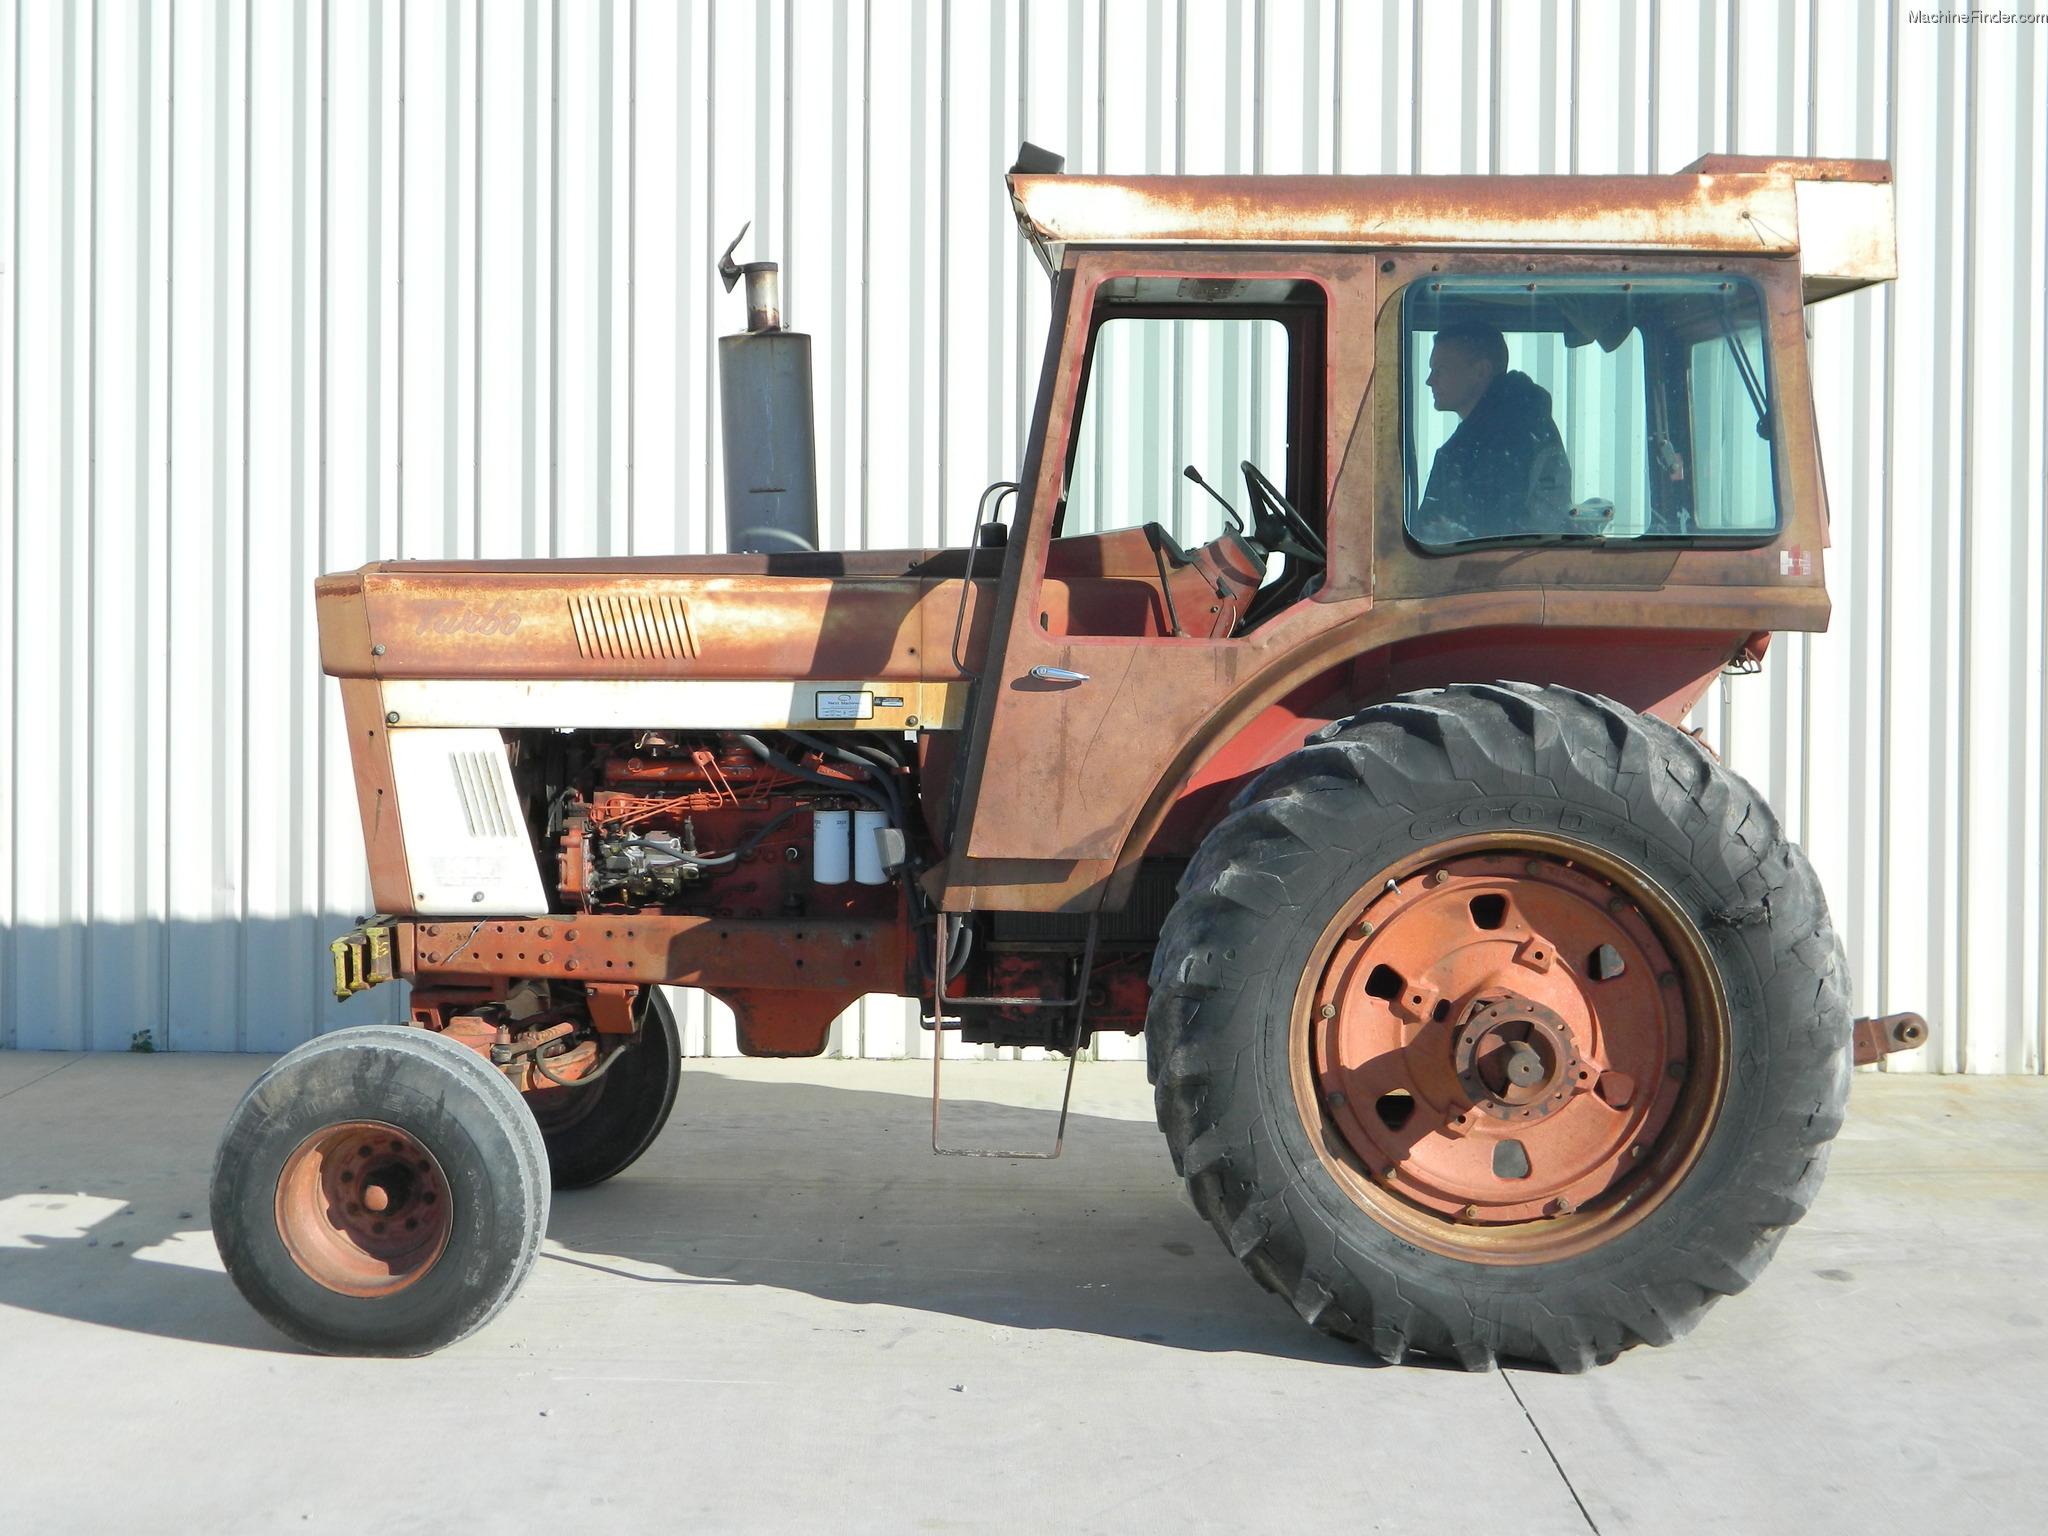 Parts For 1066 Ih Tractor : International harvester tractors row crop